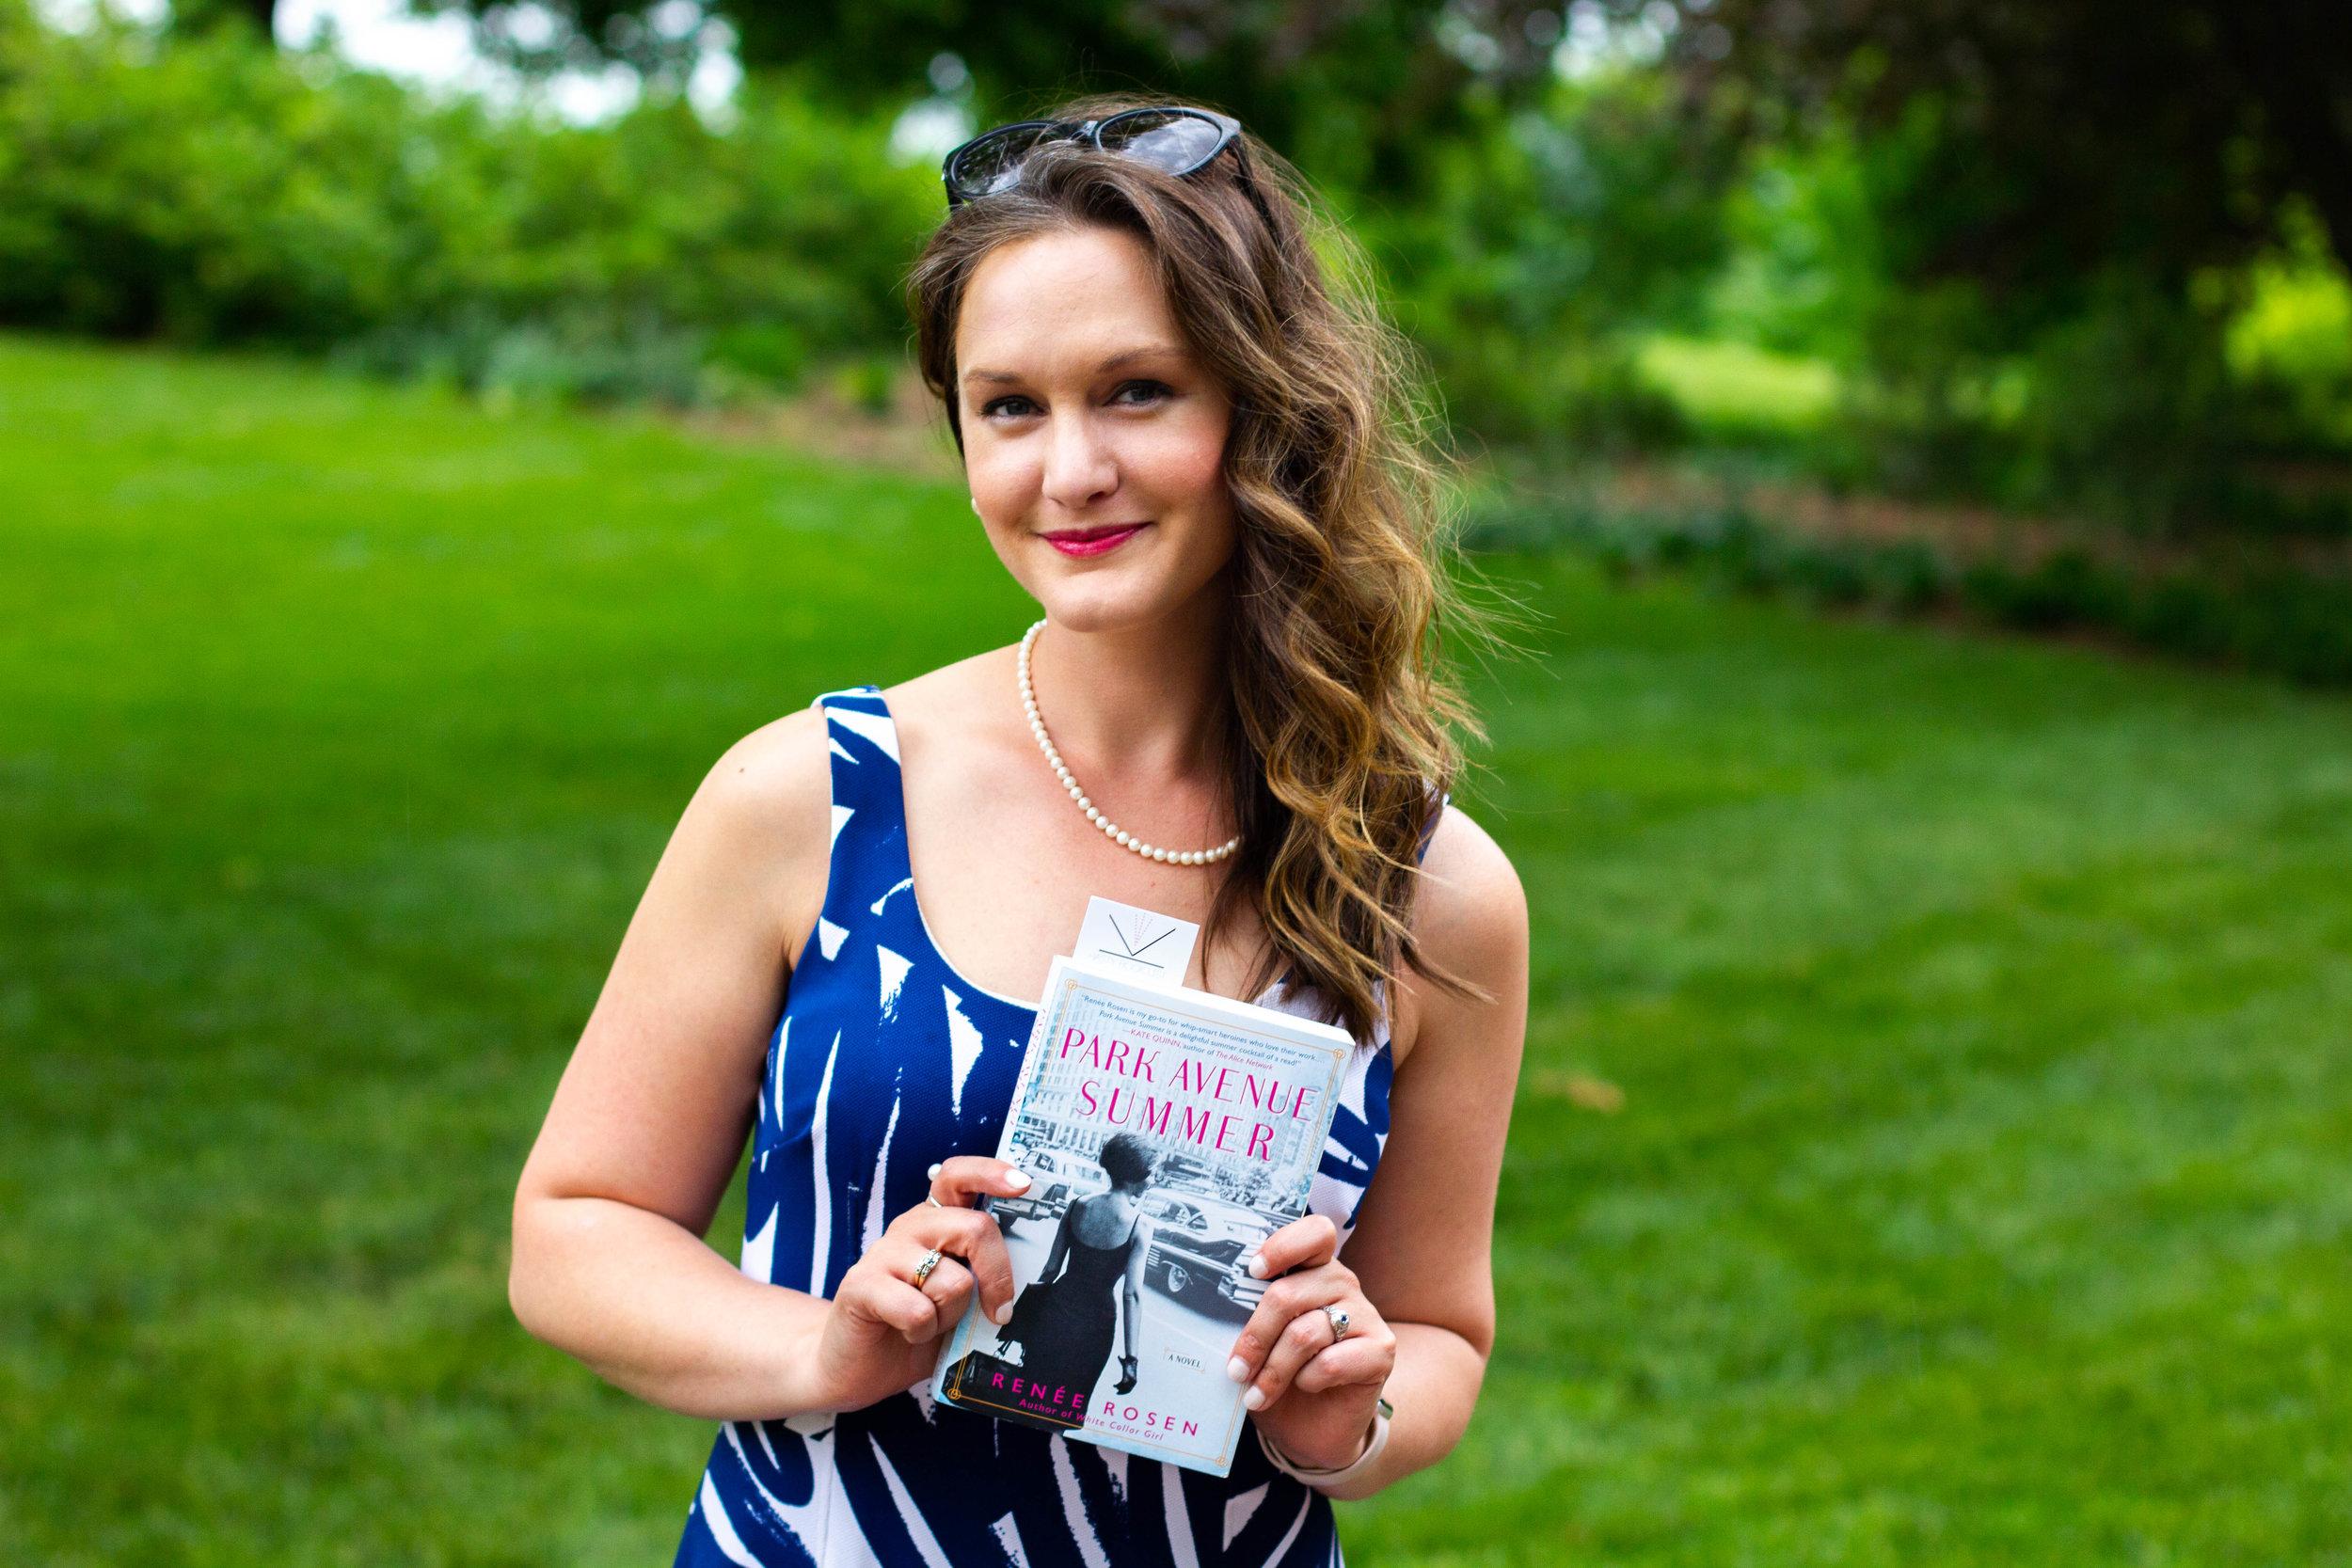 Reading Park Avenue Summer by Renee Rosen in Roanoke, VA